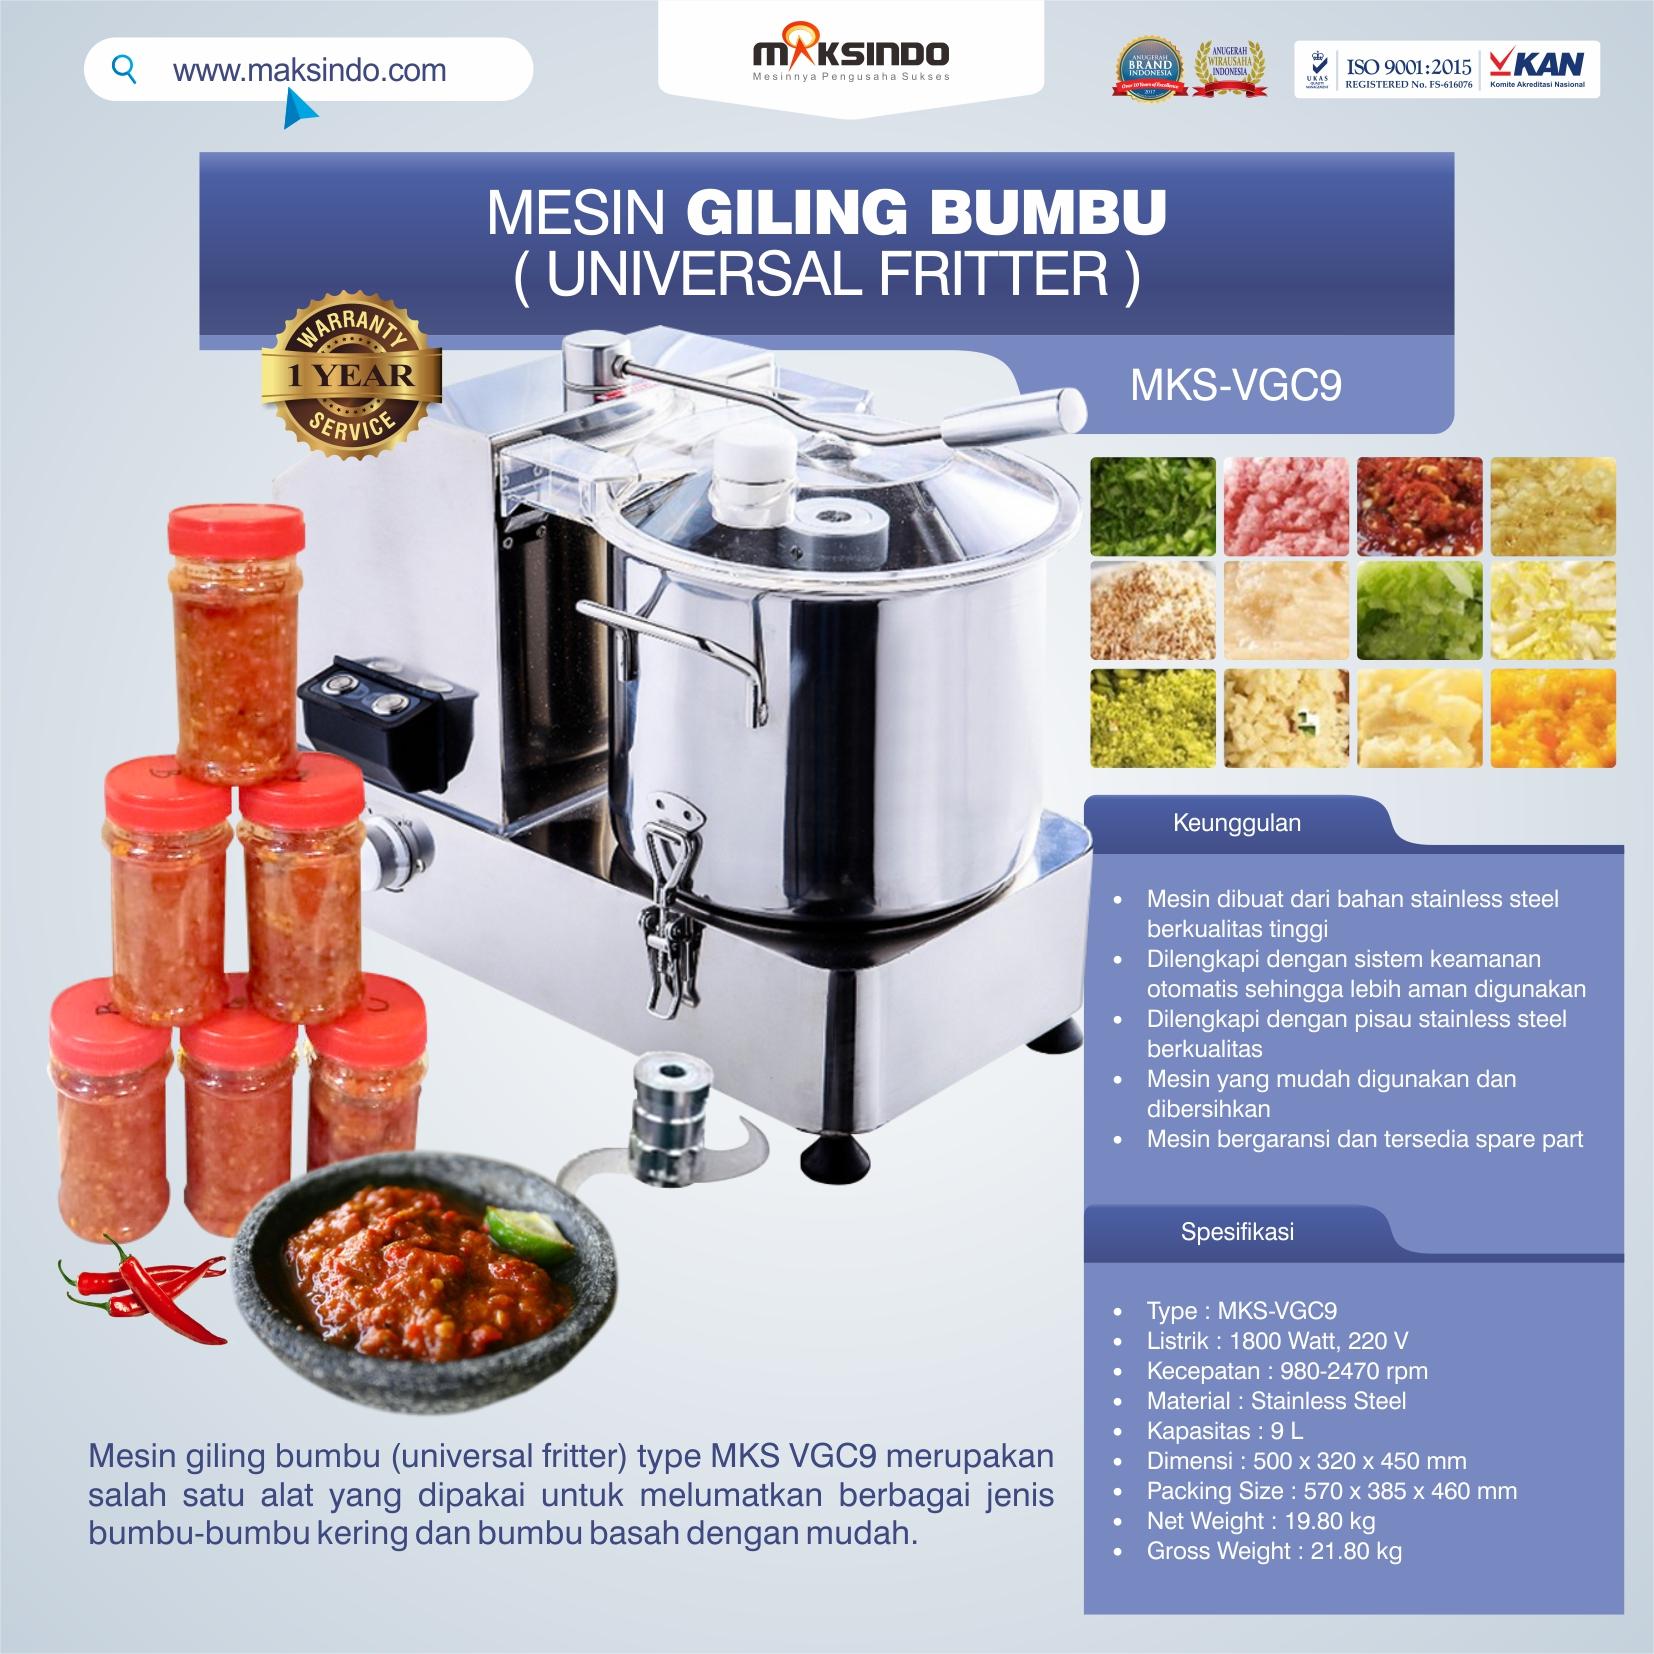 Jual Mesin Giling Bumbu (Universal Fritter) MKS VGC9 di Mataram